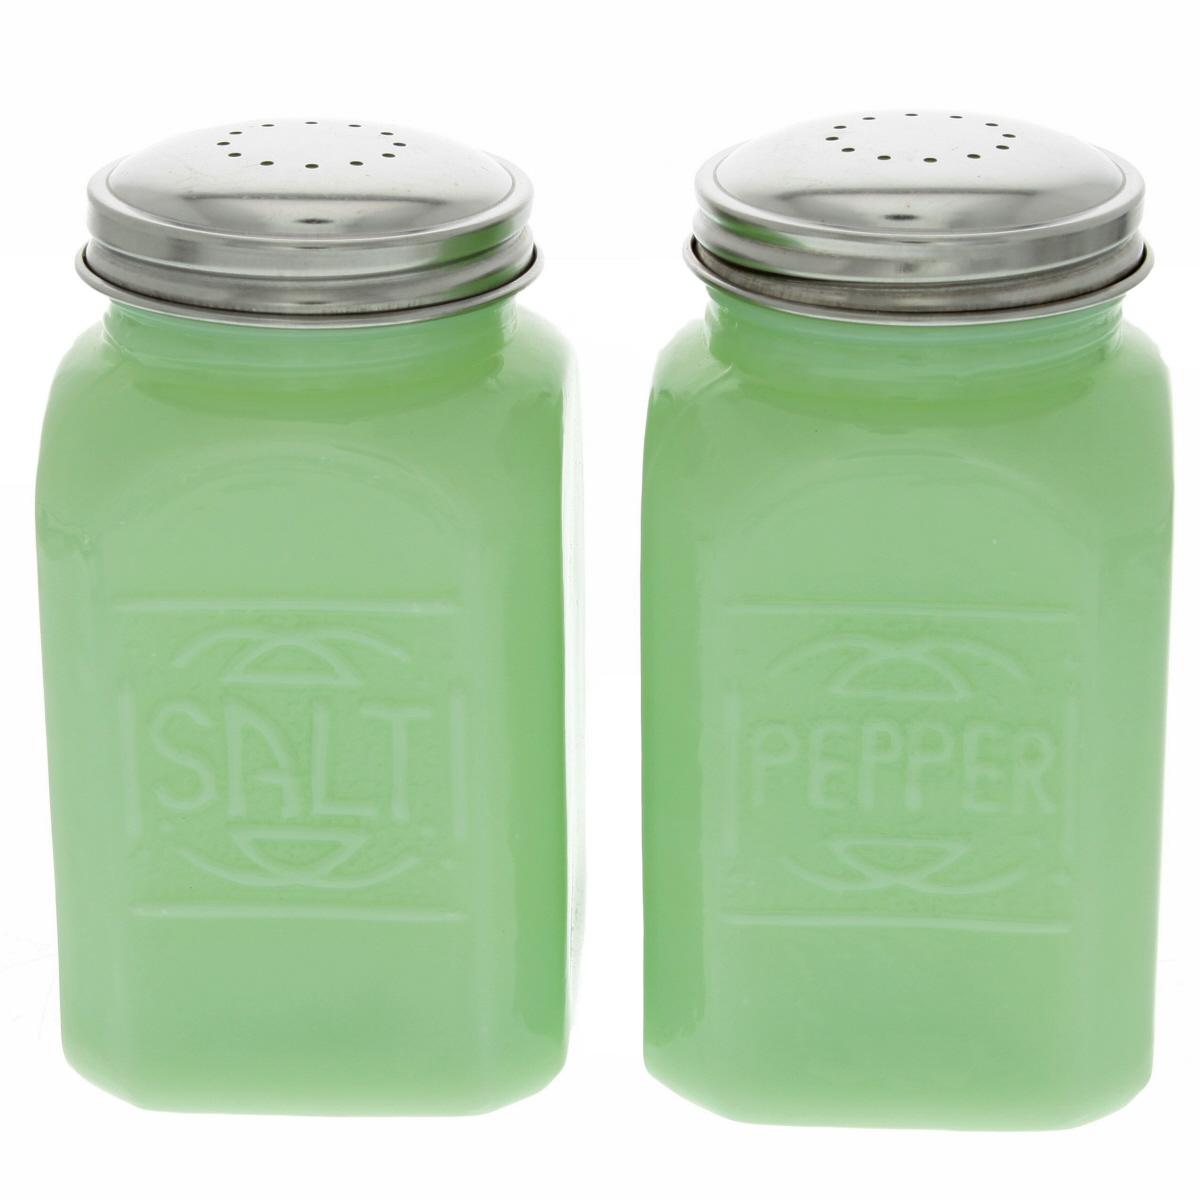 retro-planet-milk-glass-shakers-image